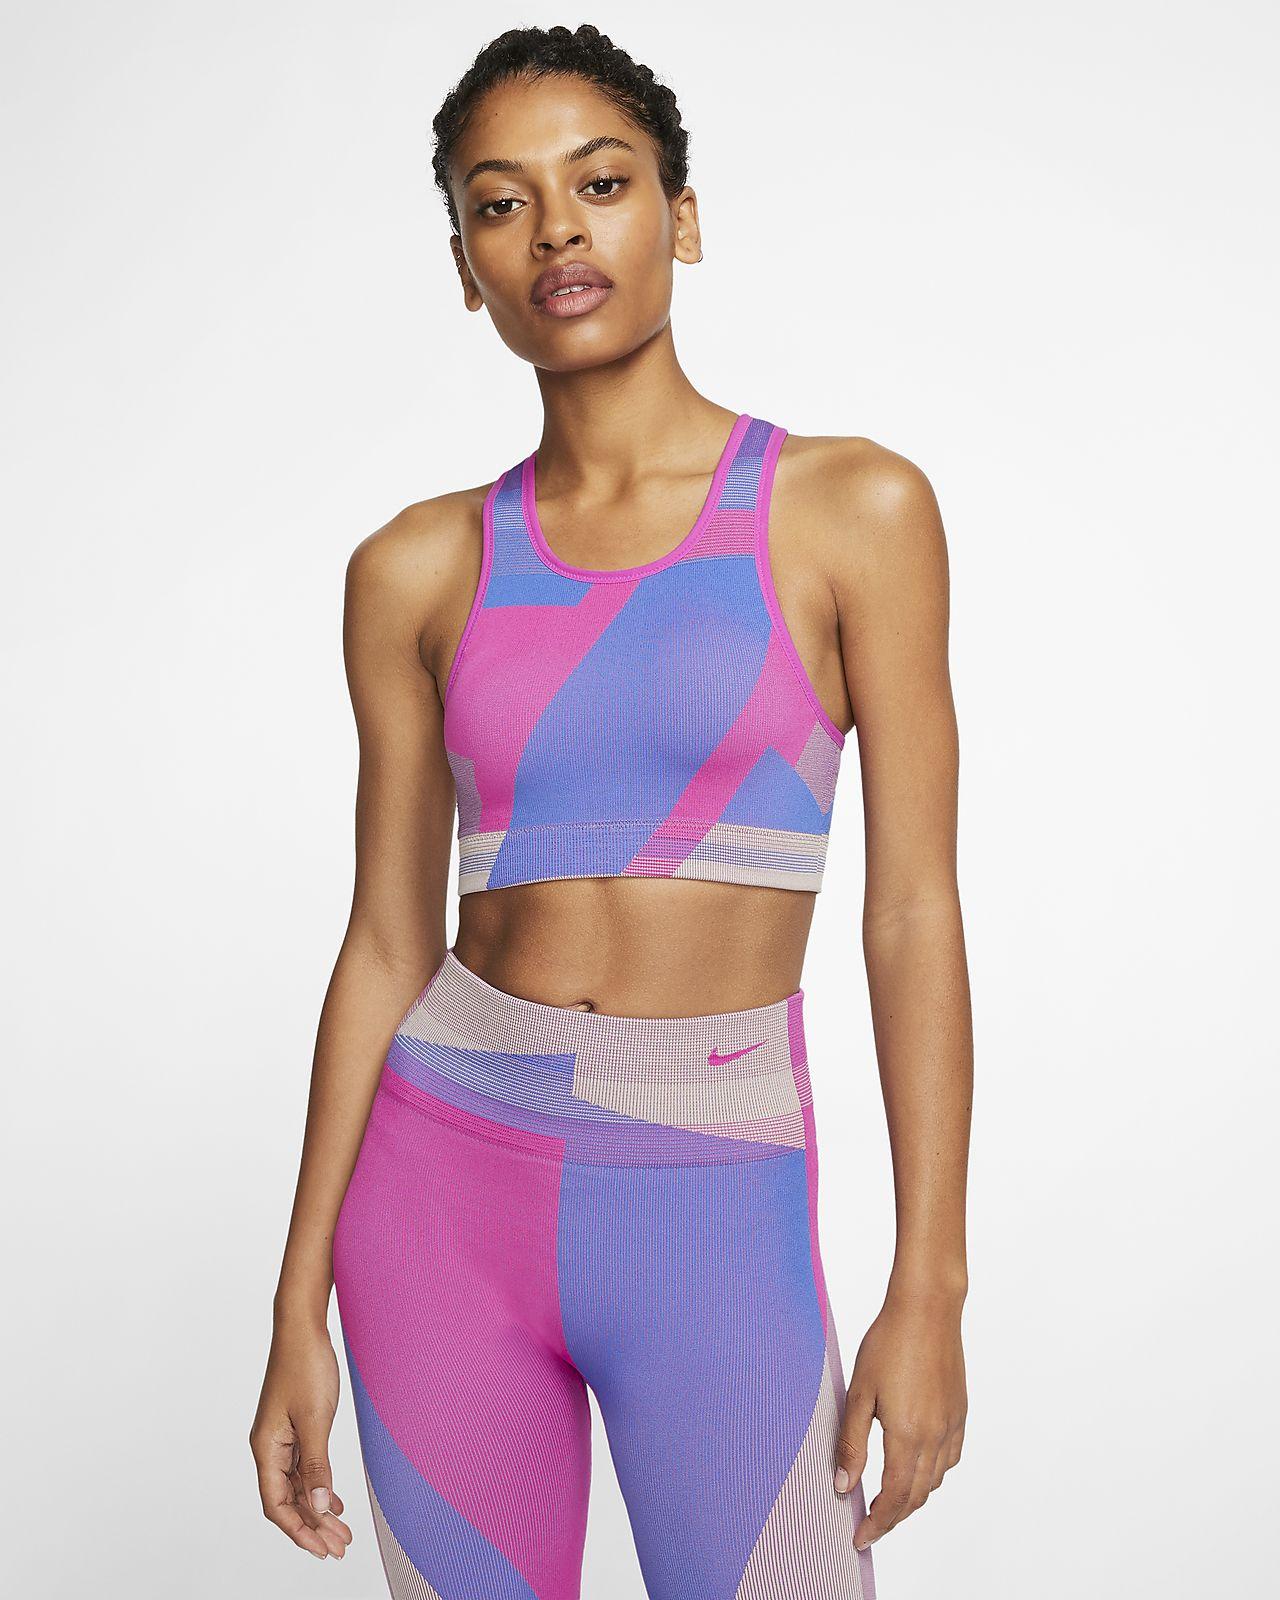 Nike Indy Womens Seamless Light-Support Sports Bra. Nike SG